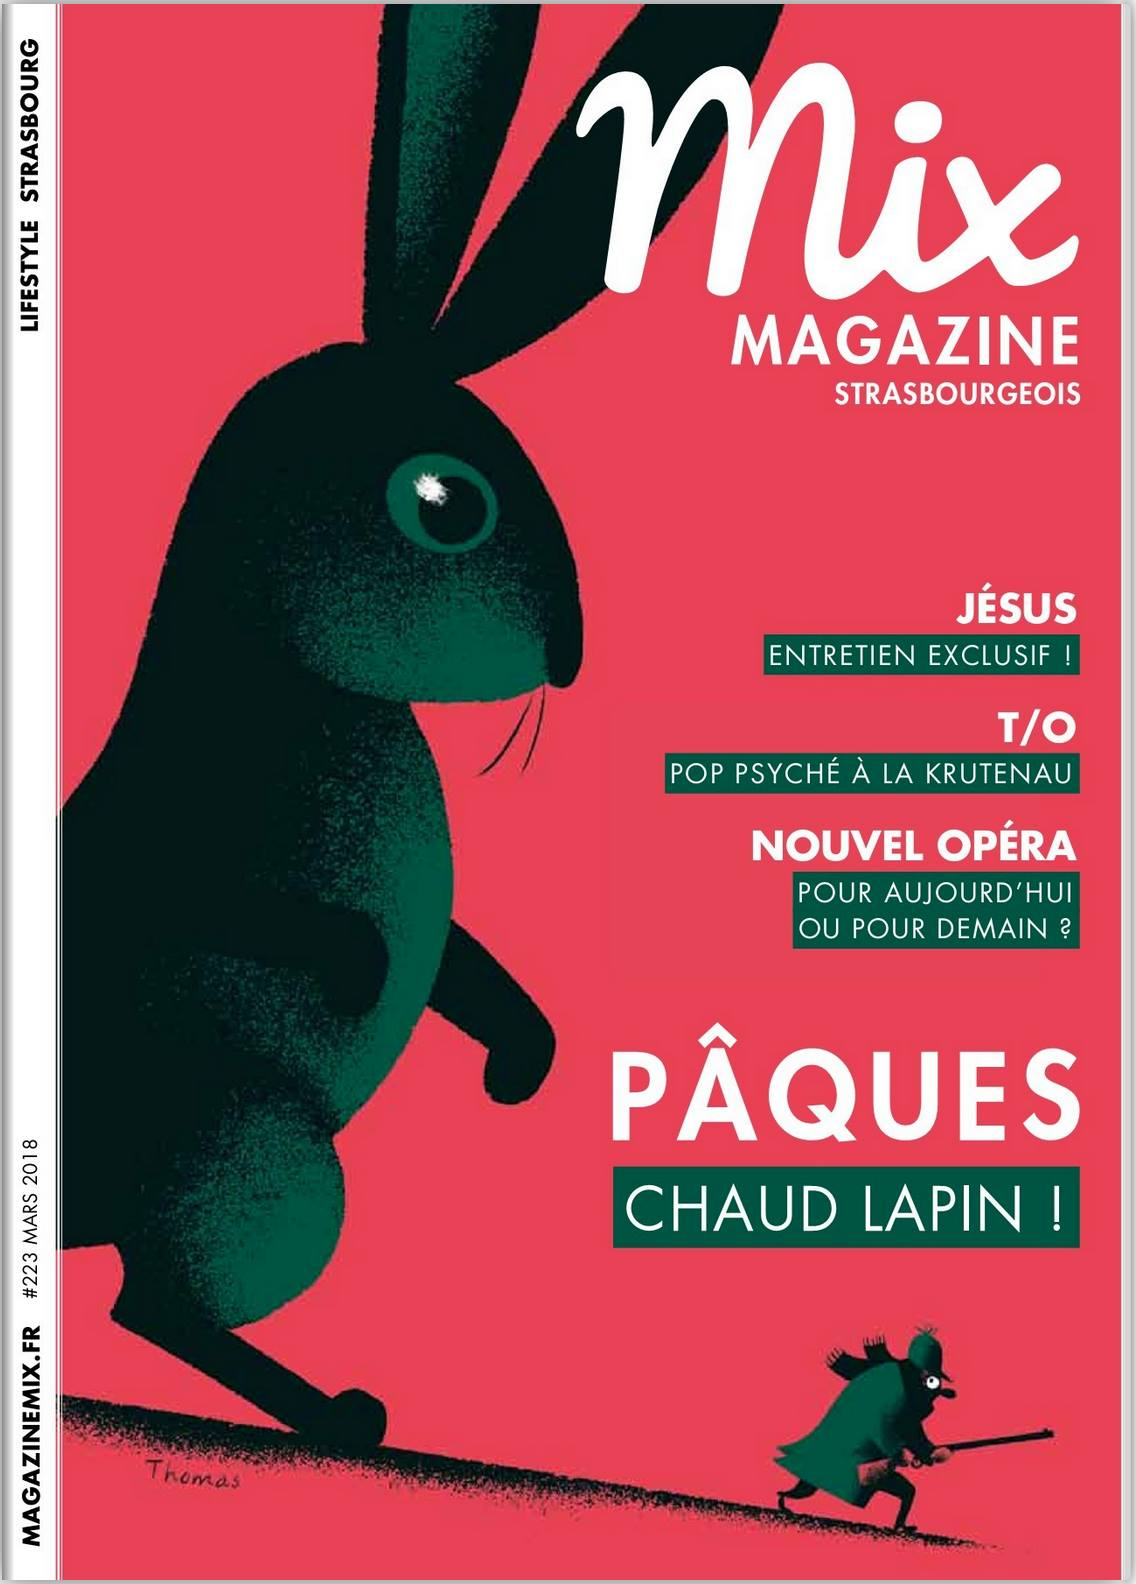 Mix-magazine-Mars-2018-Couverture.jpg